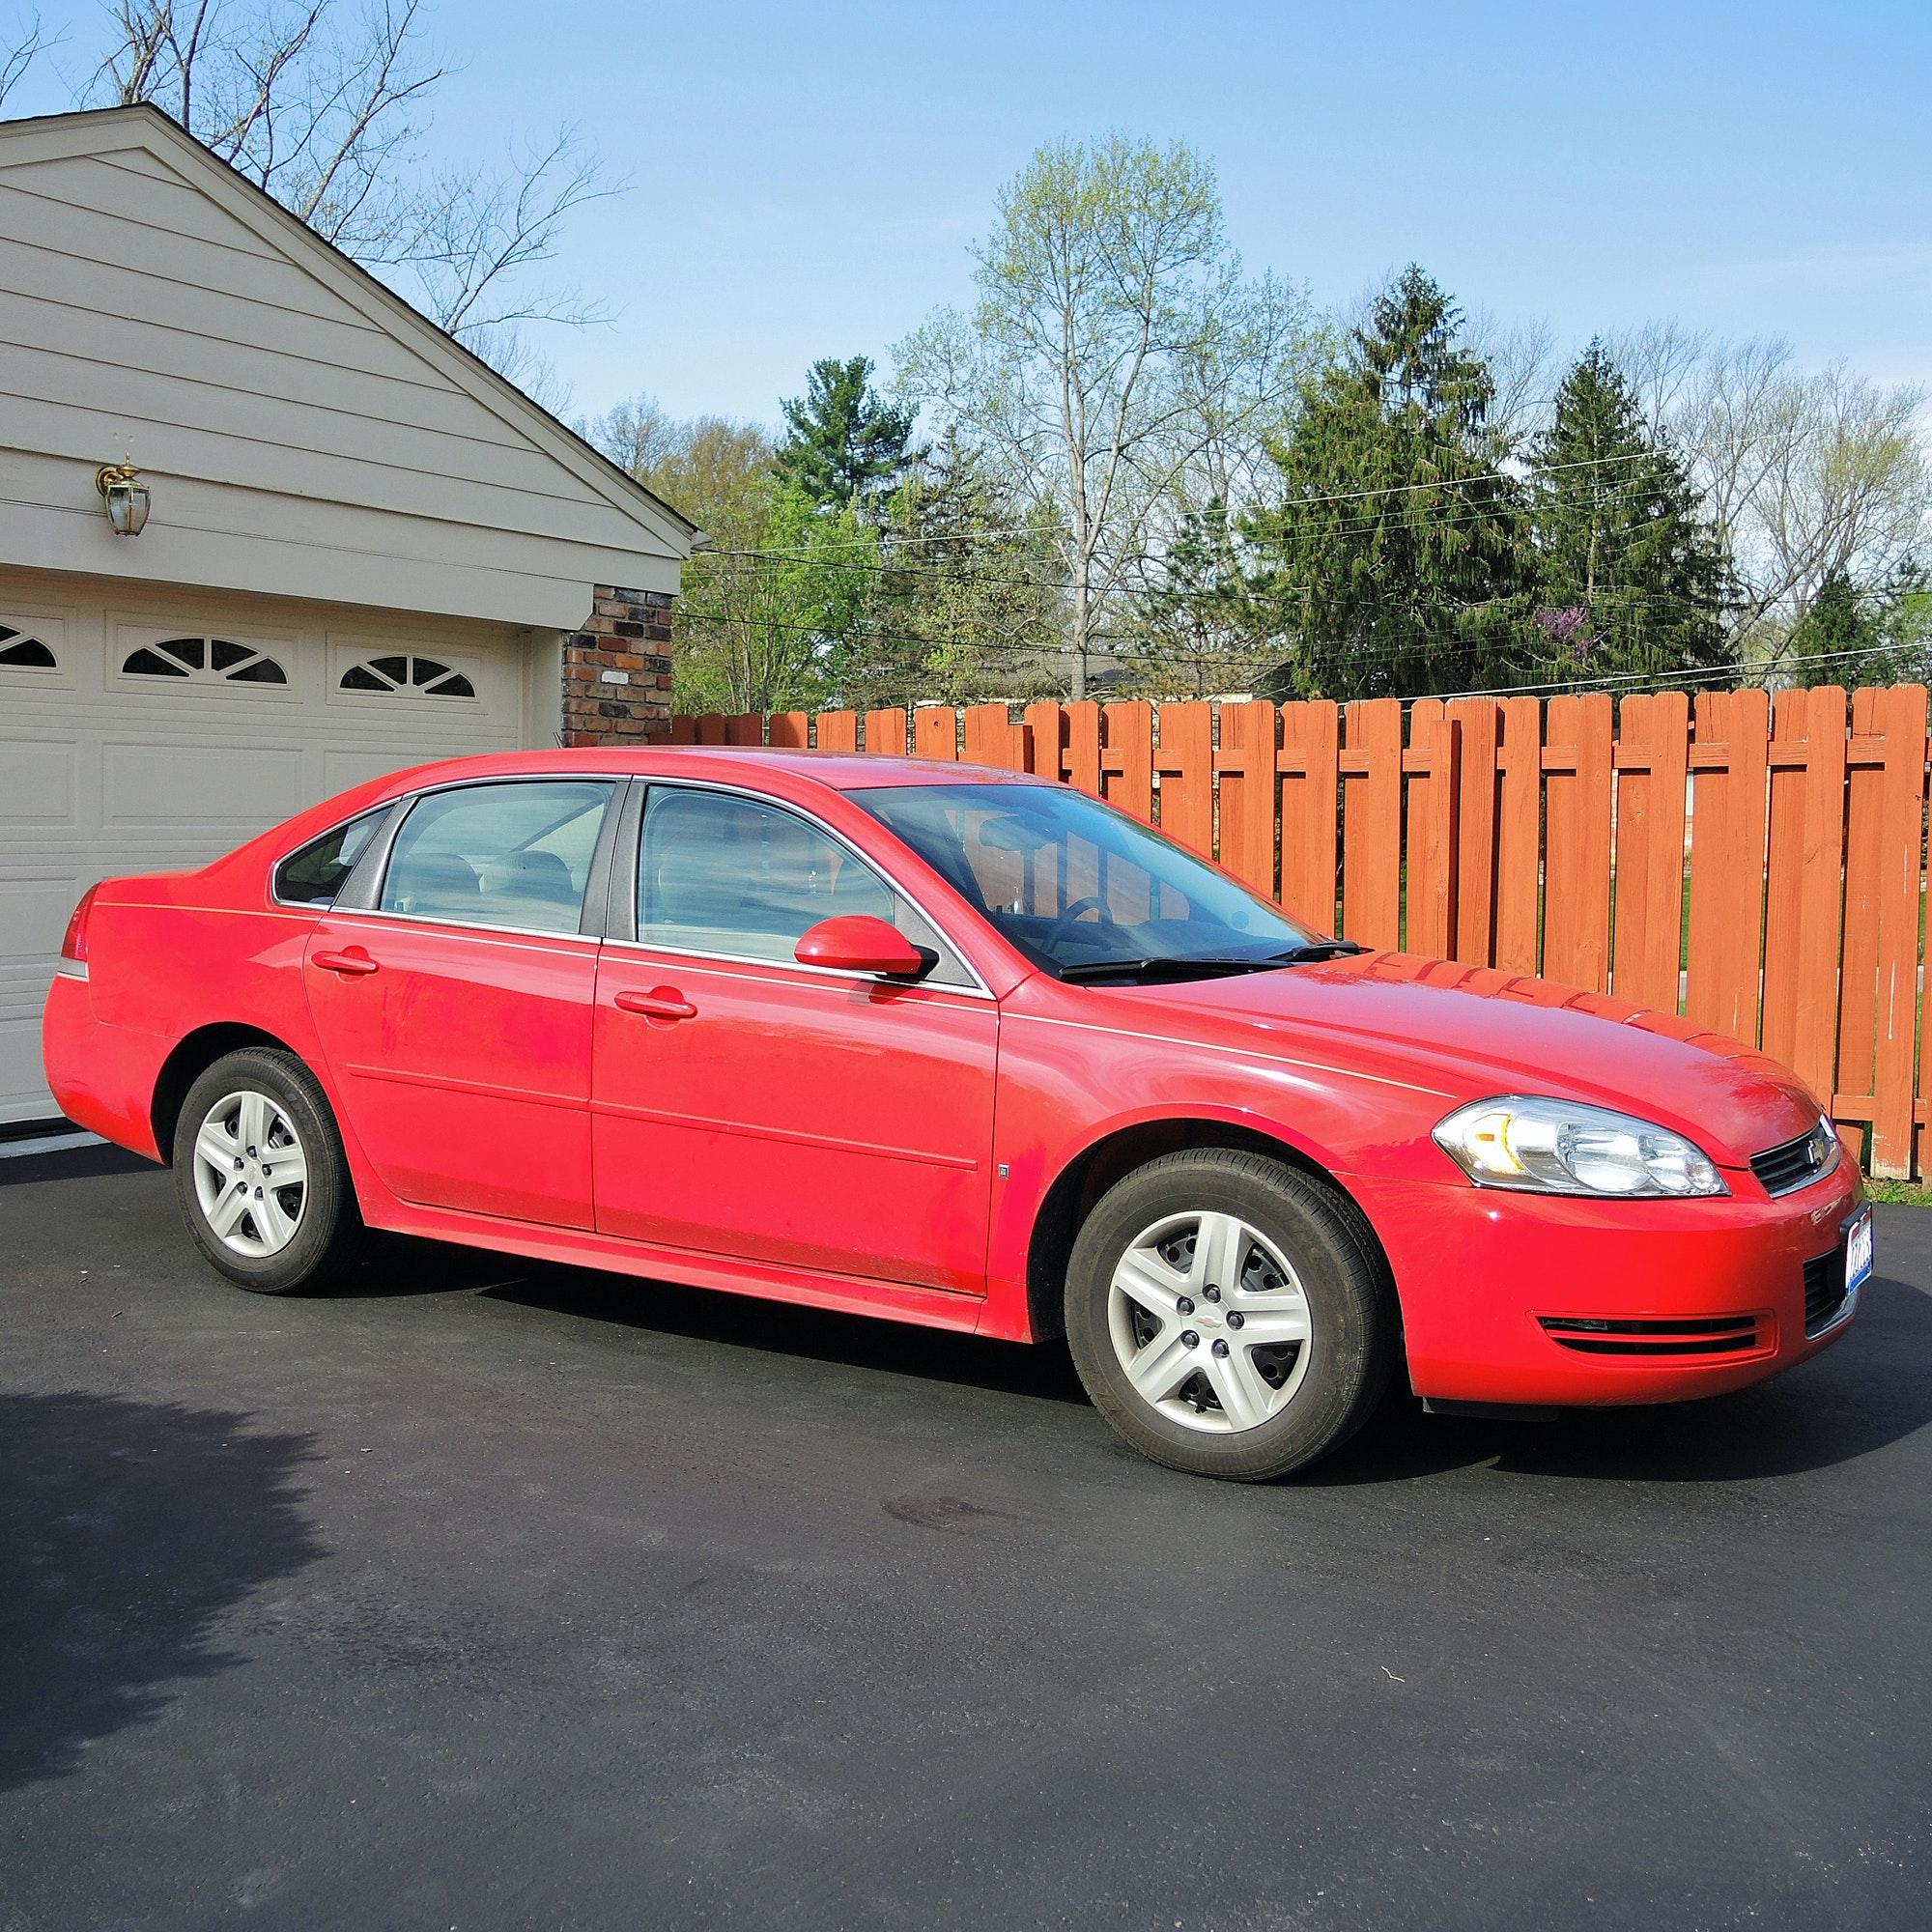 2010 Red Chevy Impala Sedan